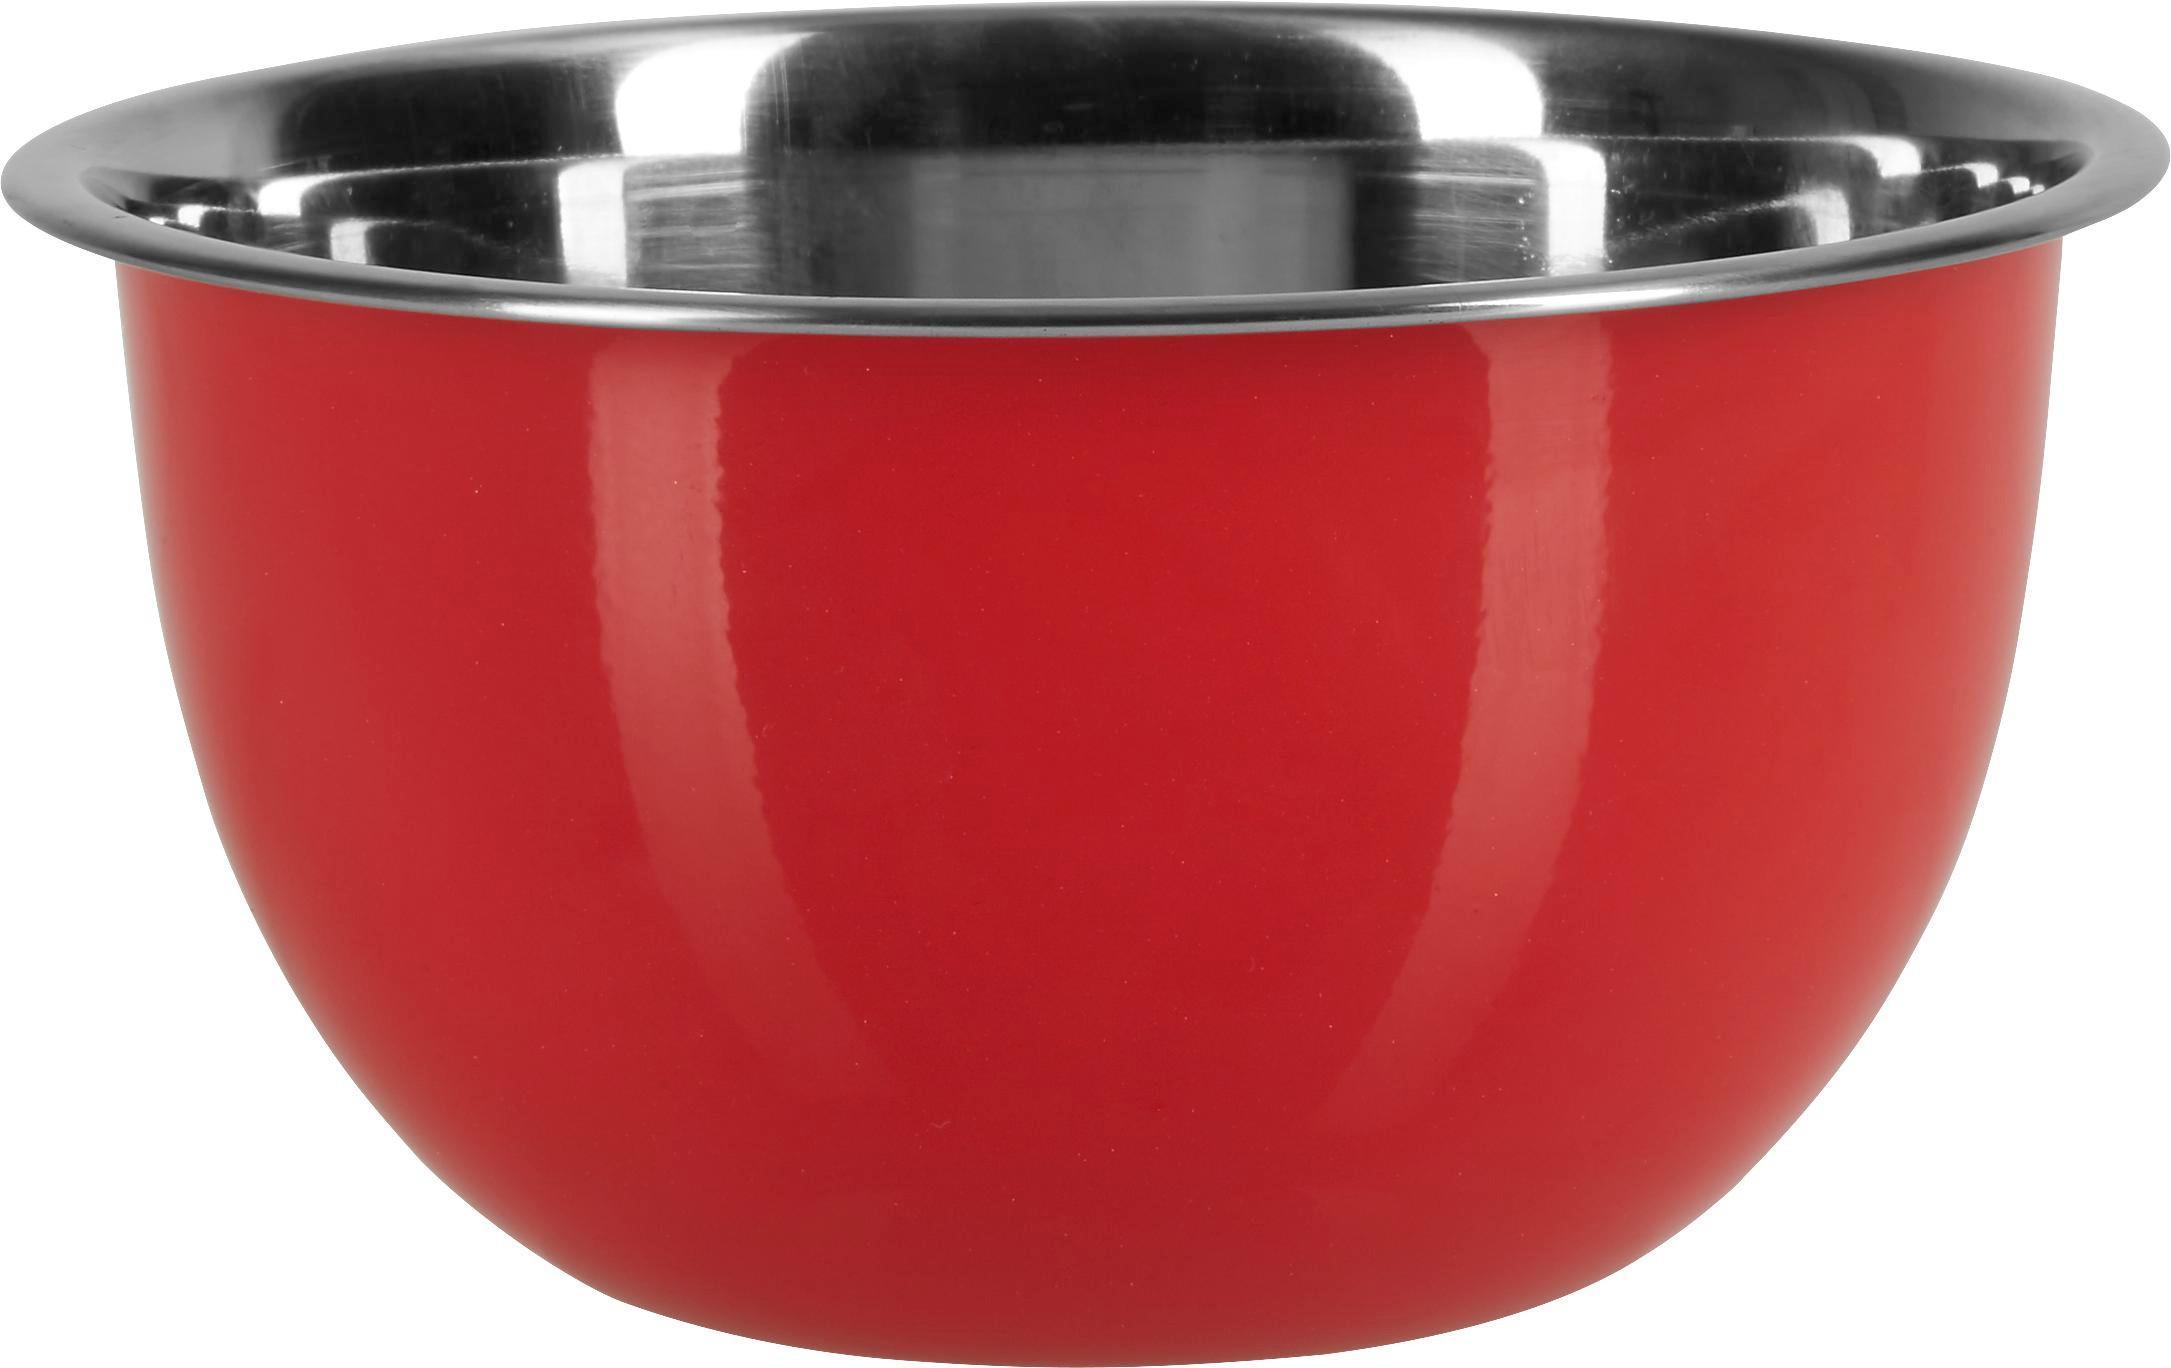 Schüssel Dani in Rot, Ø ca. 18cm - Edelstahlfarben/Rot, Metall (18/9,5cm) - MÖMAX modern living